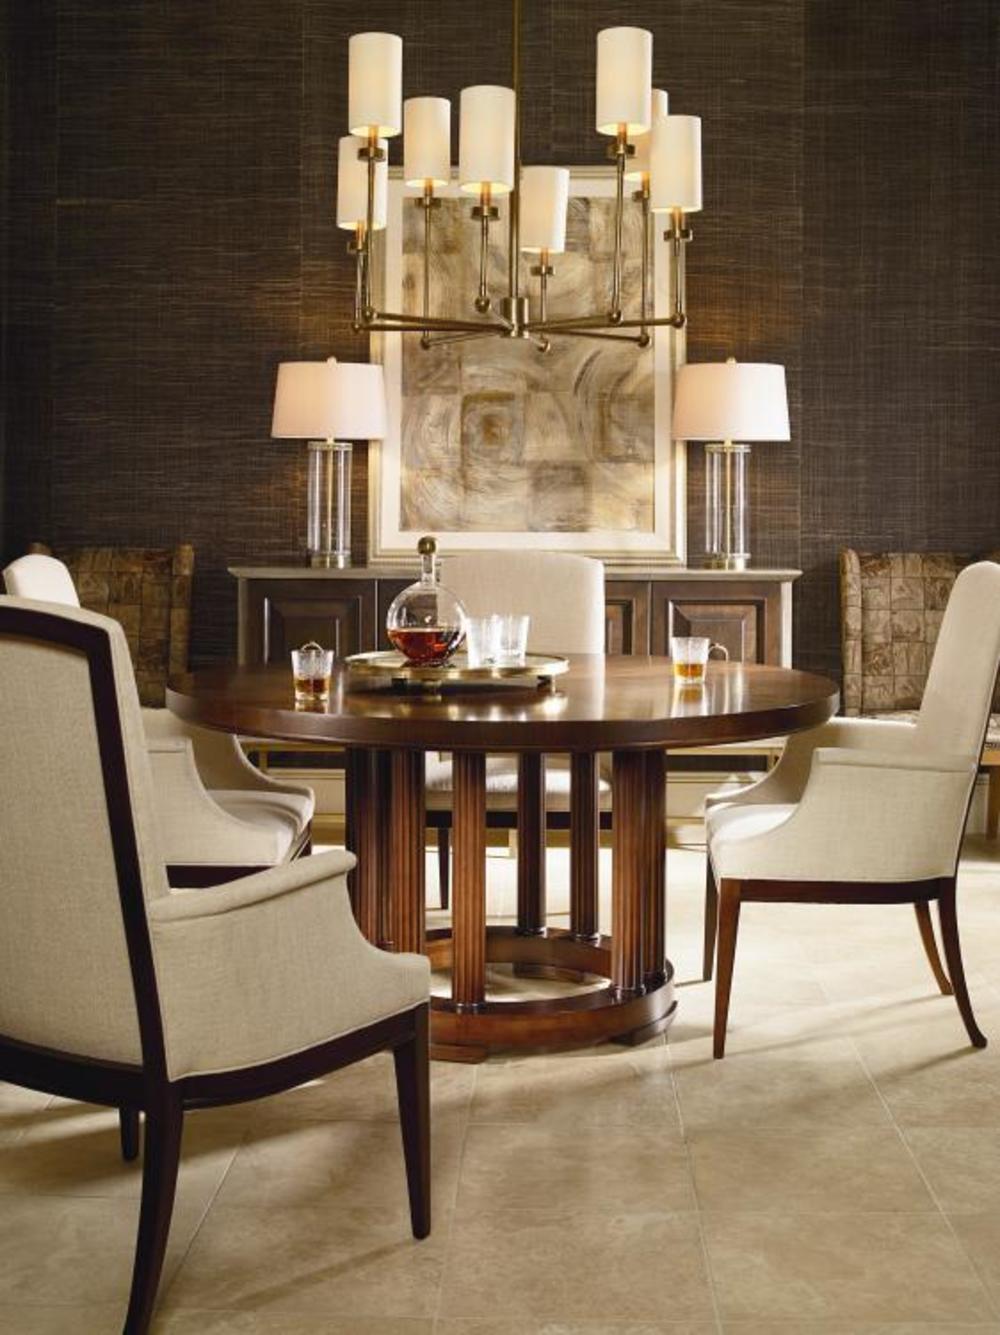 Century Furniture - Bridgeton Upholstered Dining Chair